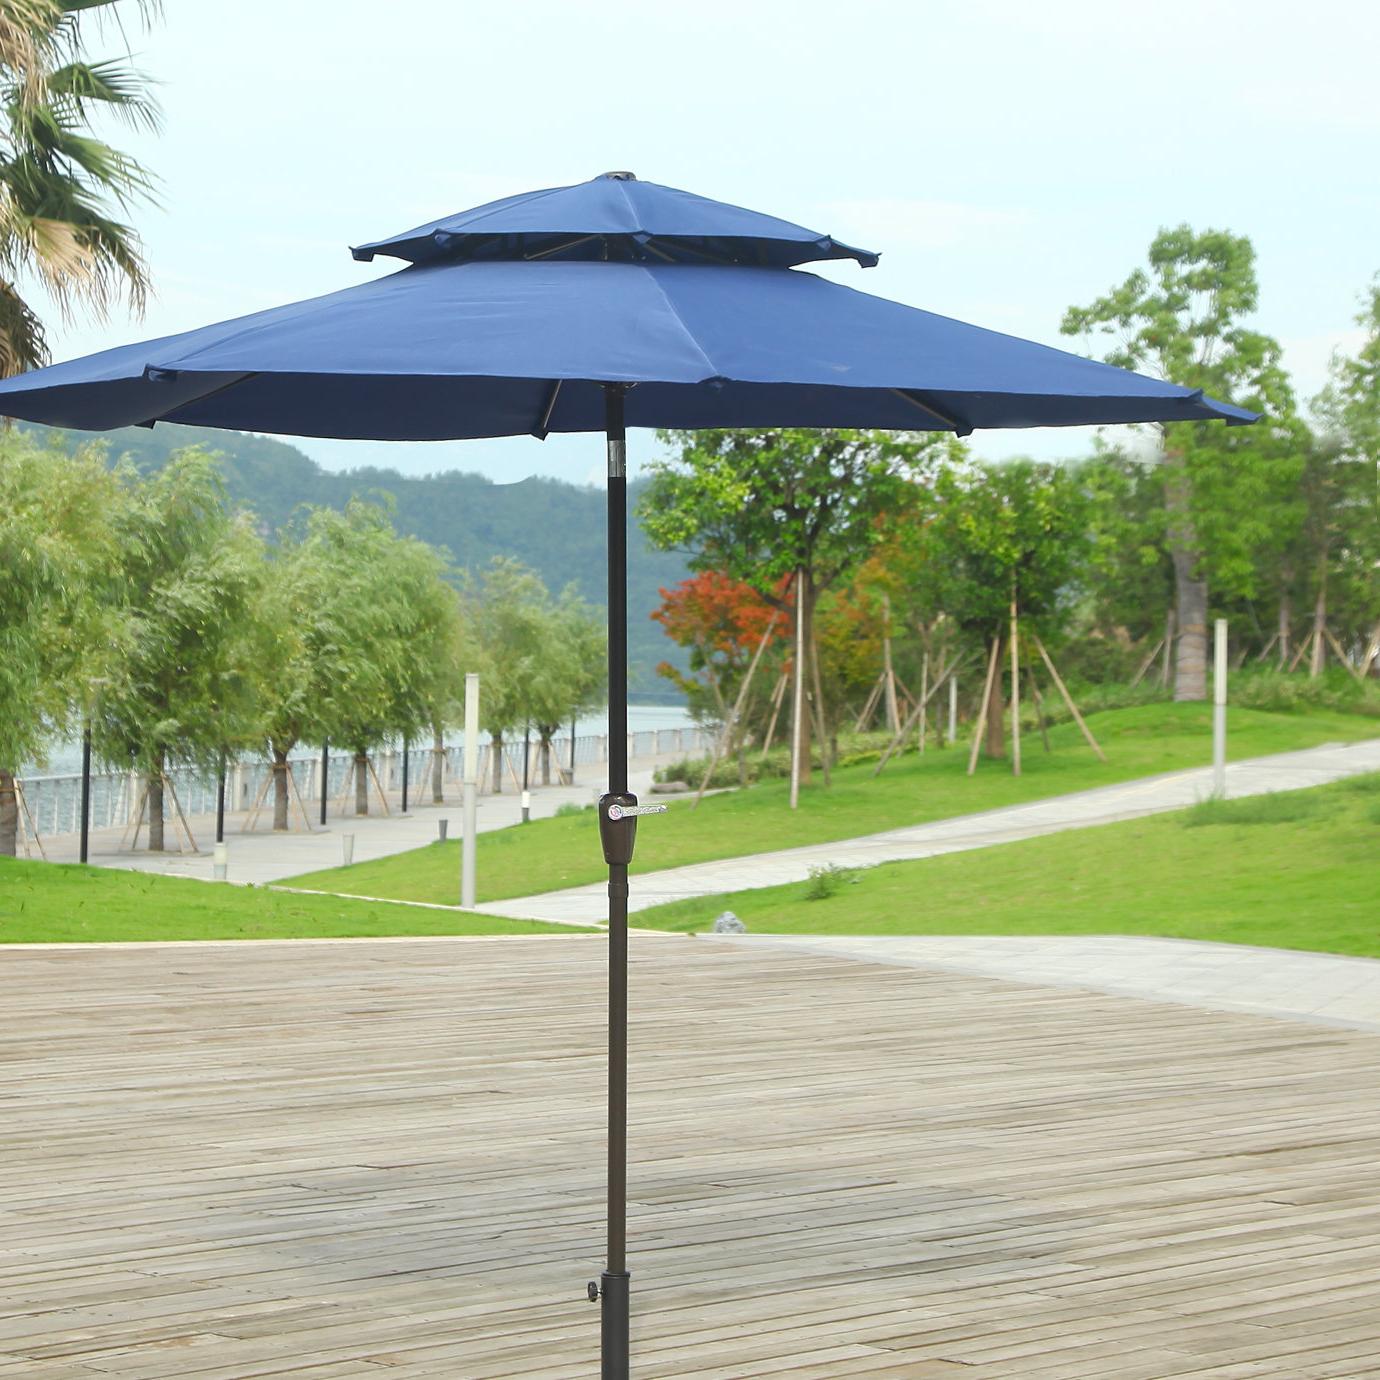 Pedrick Drape Market Umbrellas Regarding Fashionable Dimond 9' Market Umbrella (View 14 of 20)